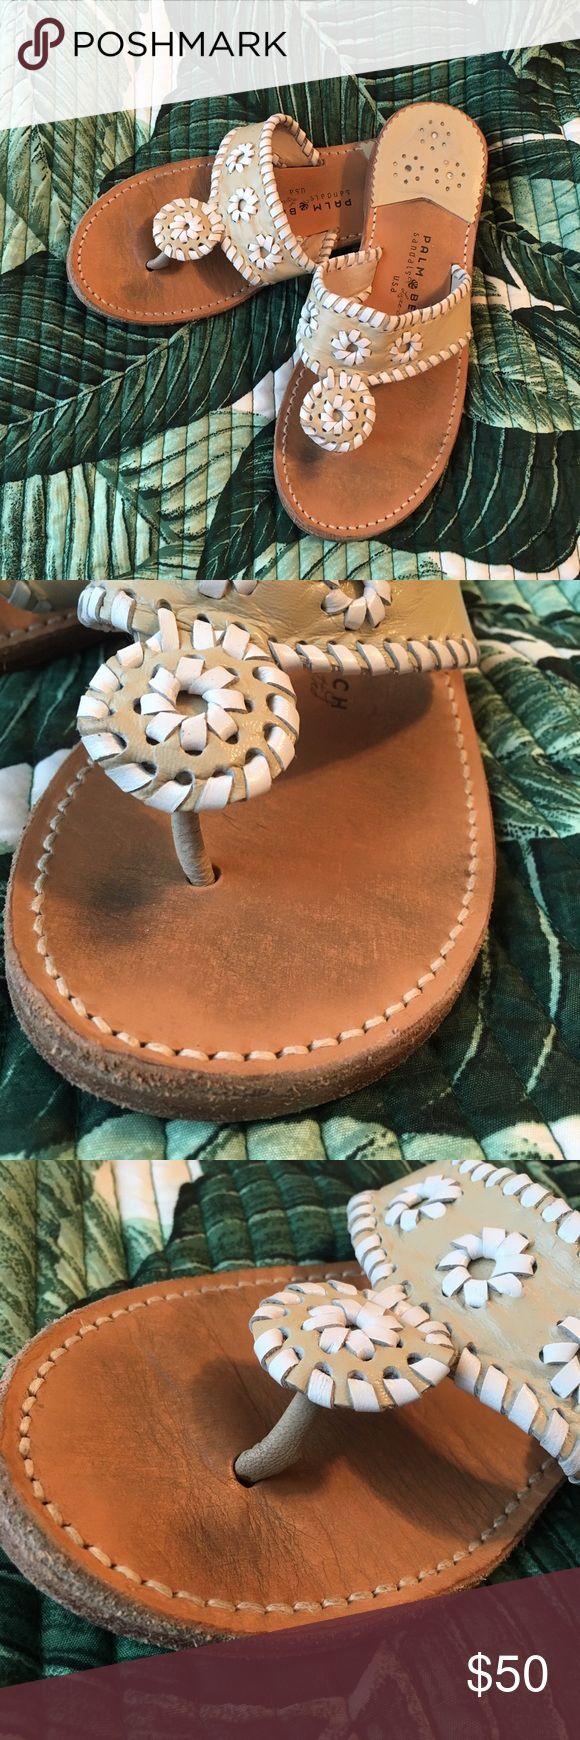 Best 25 Palm Beach Sandals Ideas On Pinterest Jack